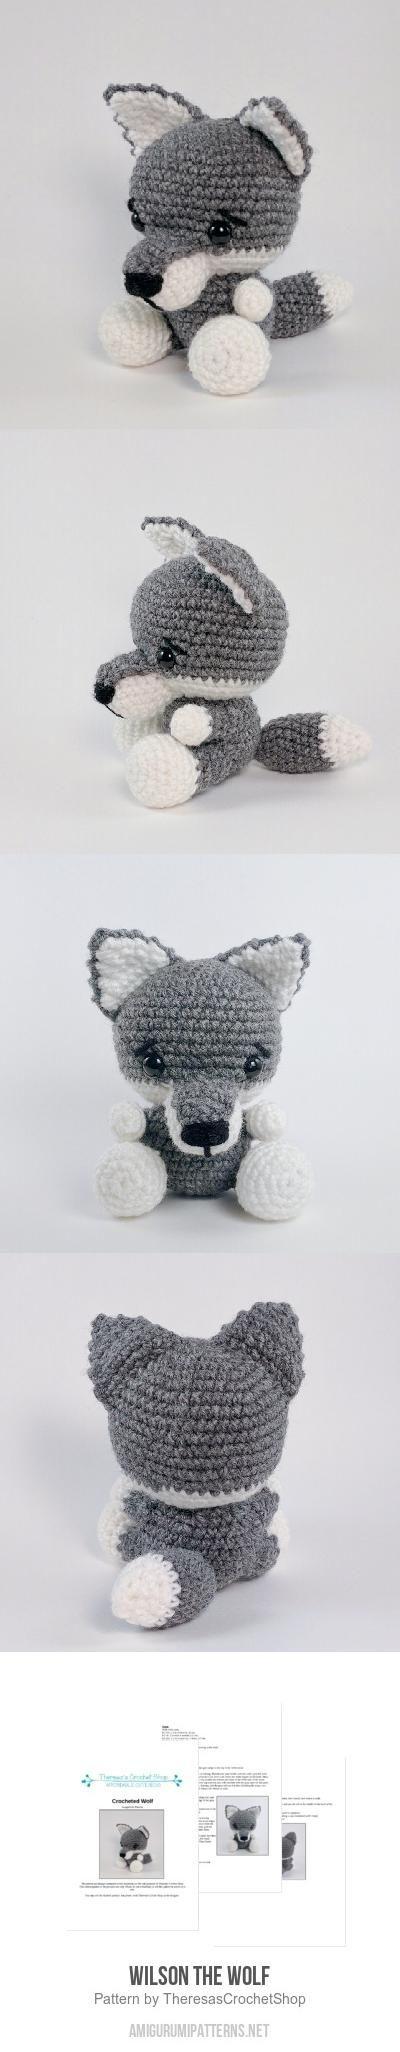 Wilson The Wolf Amigurumi Pattern                                                                                                                                                                                 More